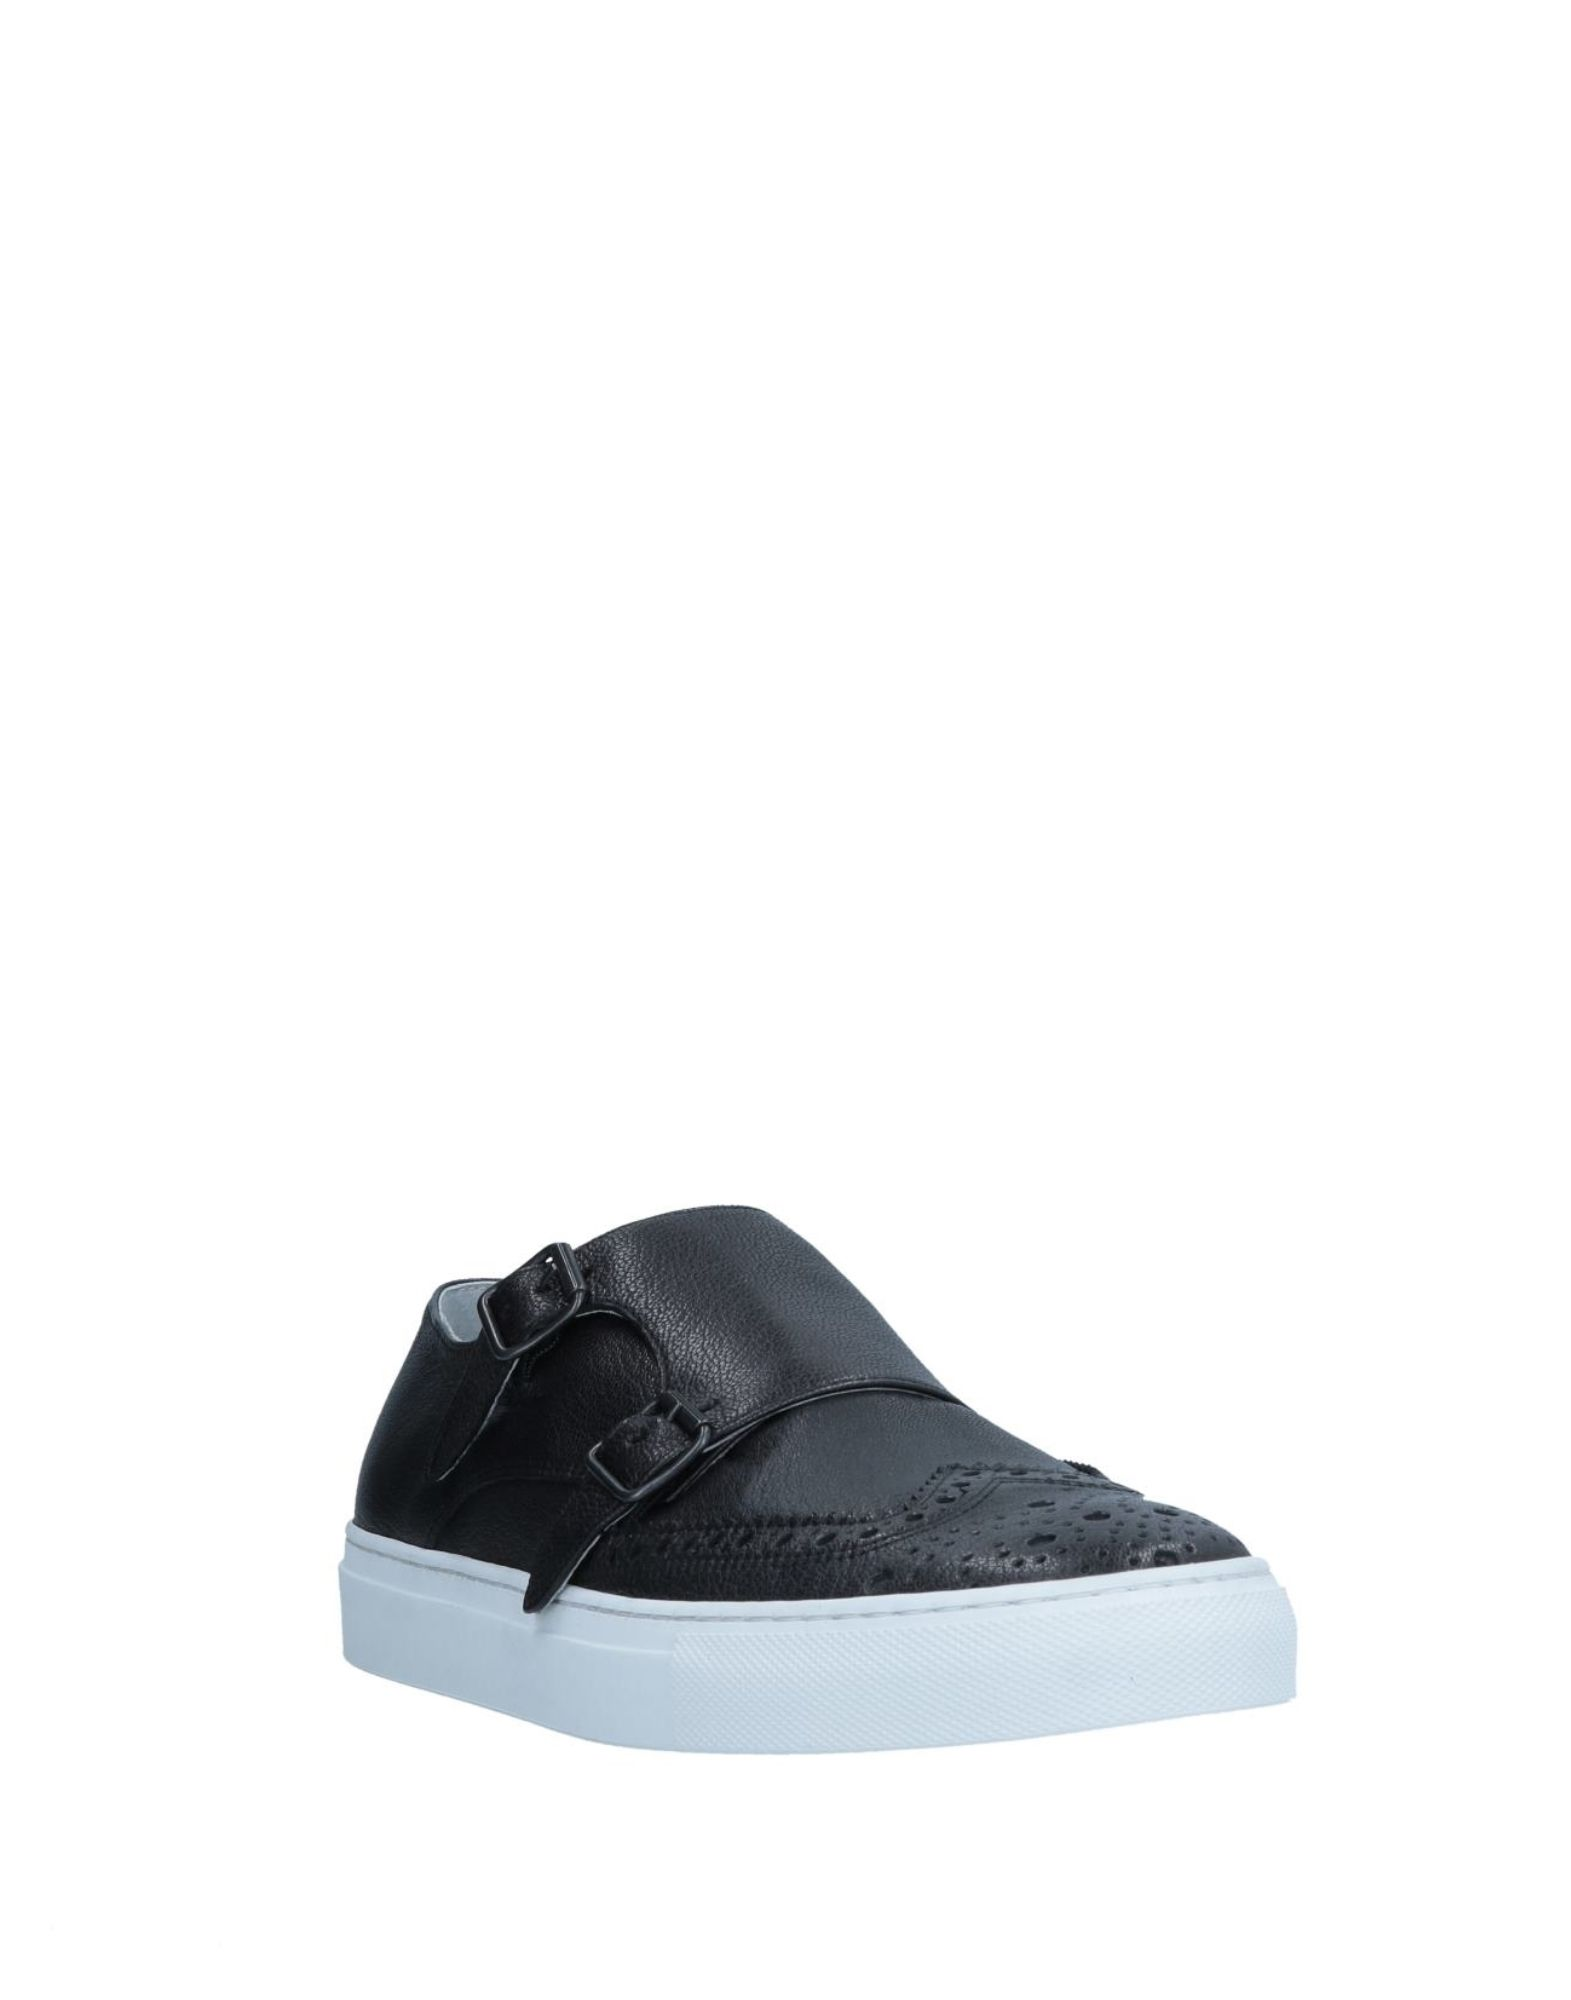 Fabiano Ricci Sneakers Herren beliebte  11546776QT Gute Qualität beliebte Herren Schuhe e4a116